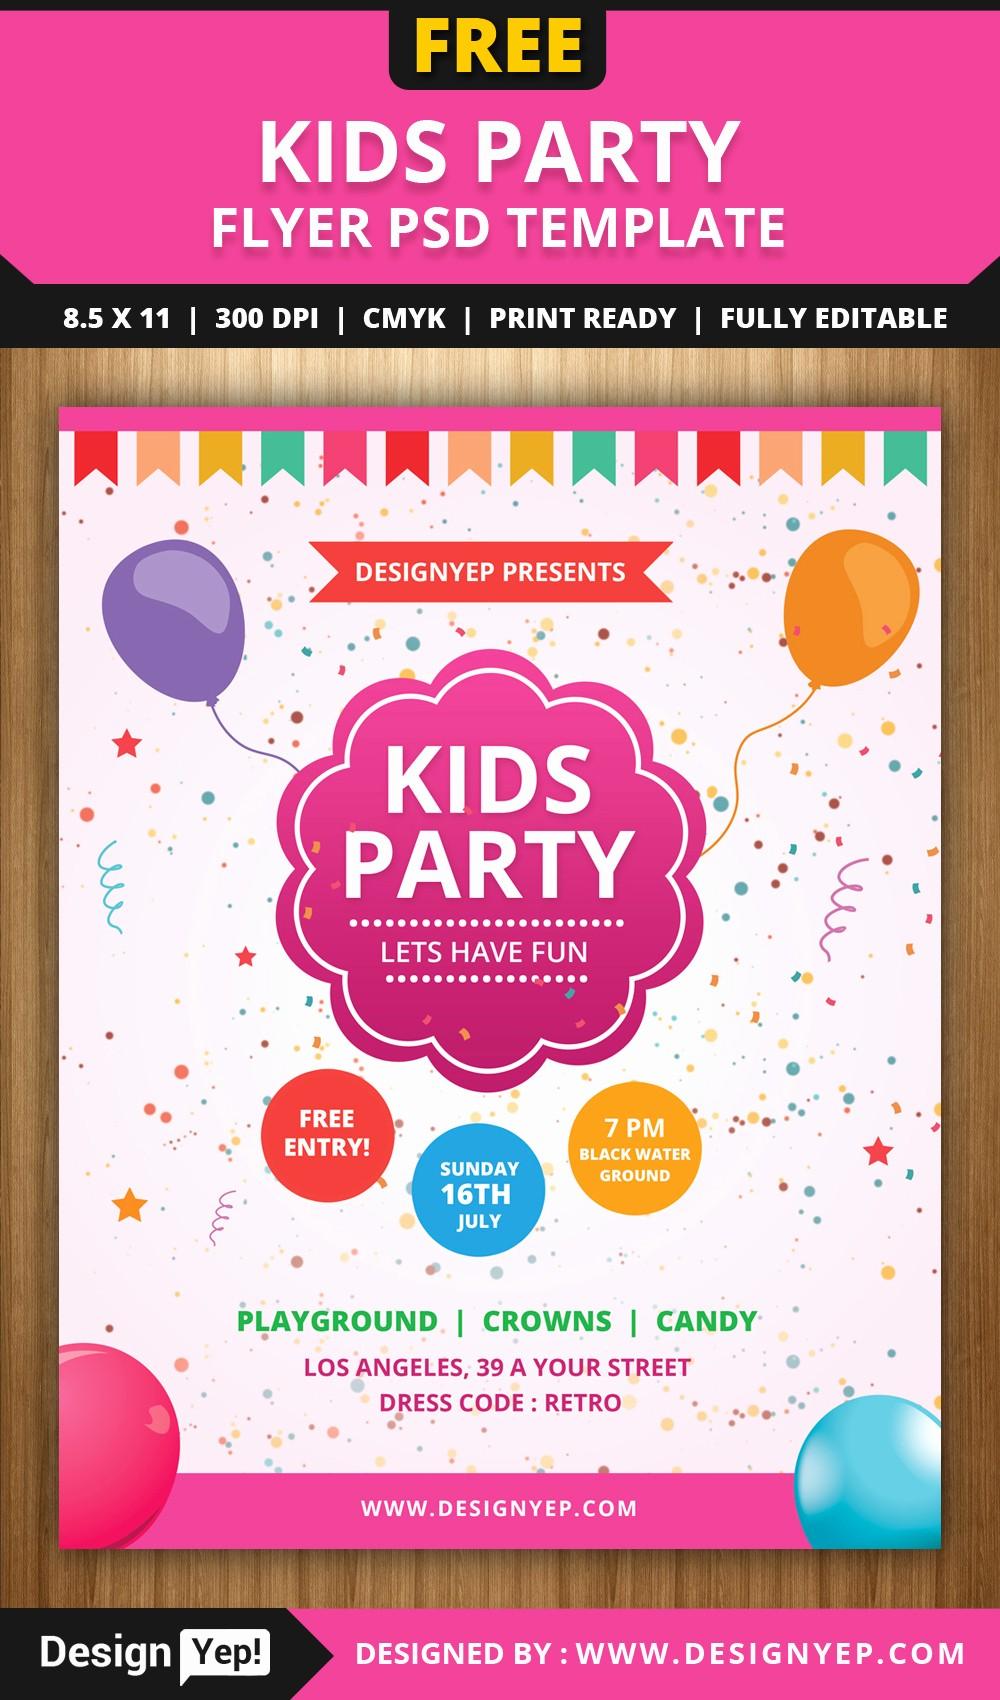 Birthday Party Flyer Template Free Fresh Free Kids Party Flyer Psd Template Designyep